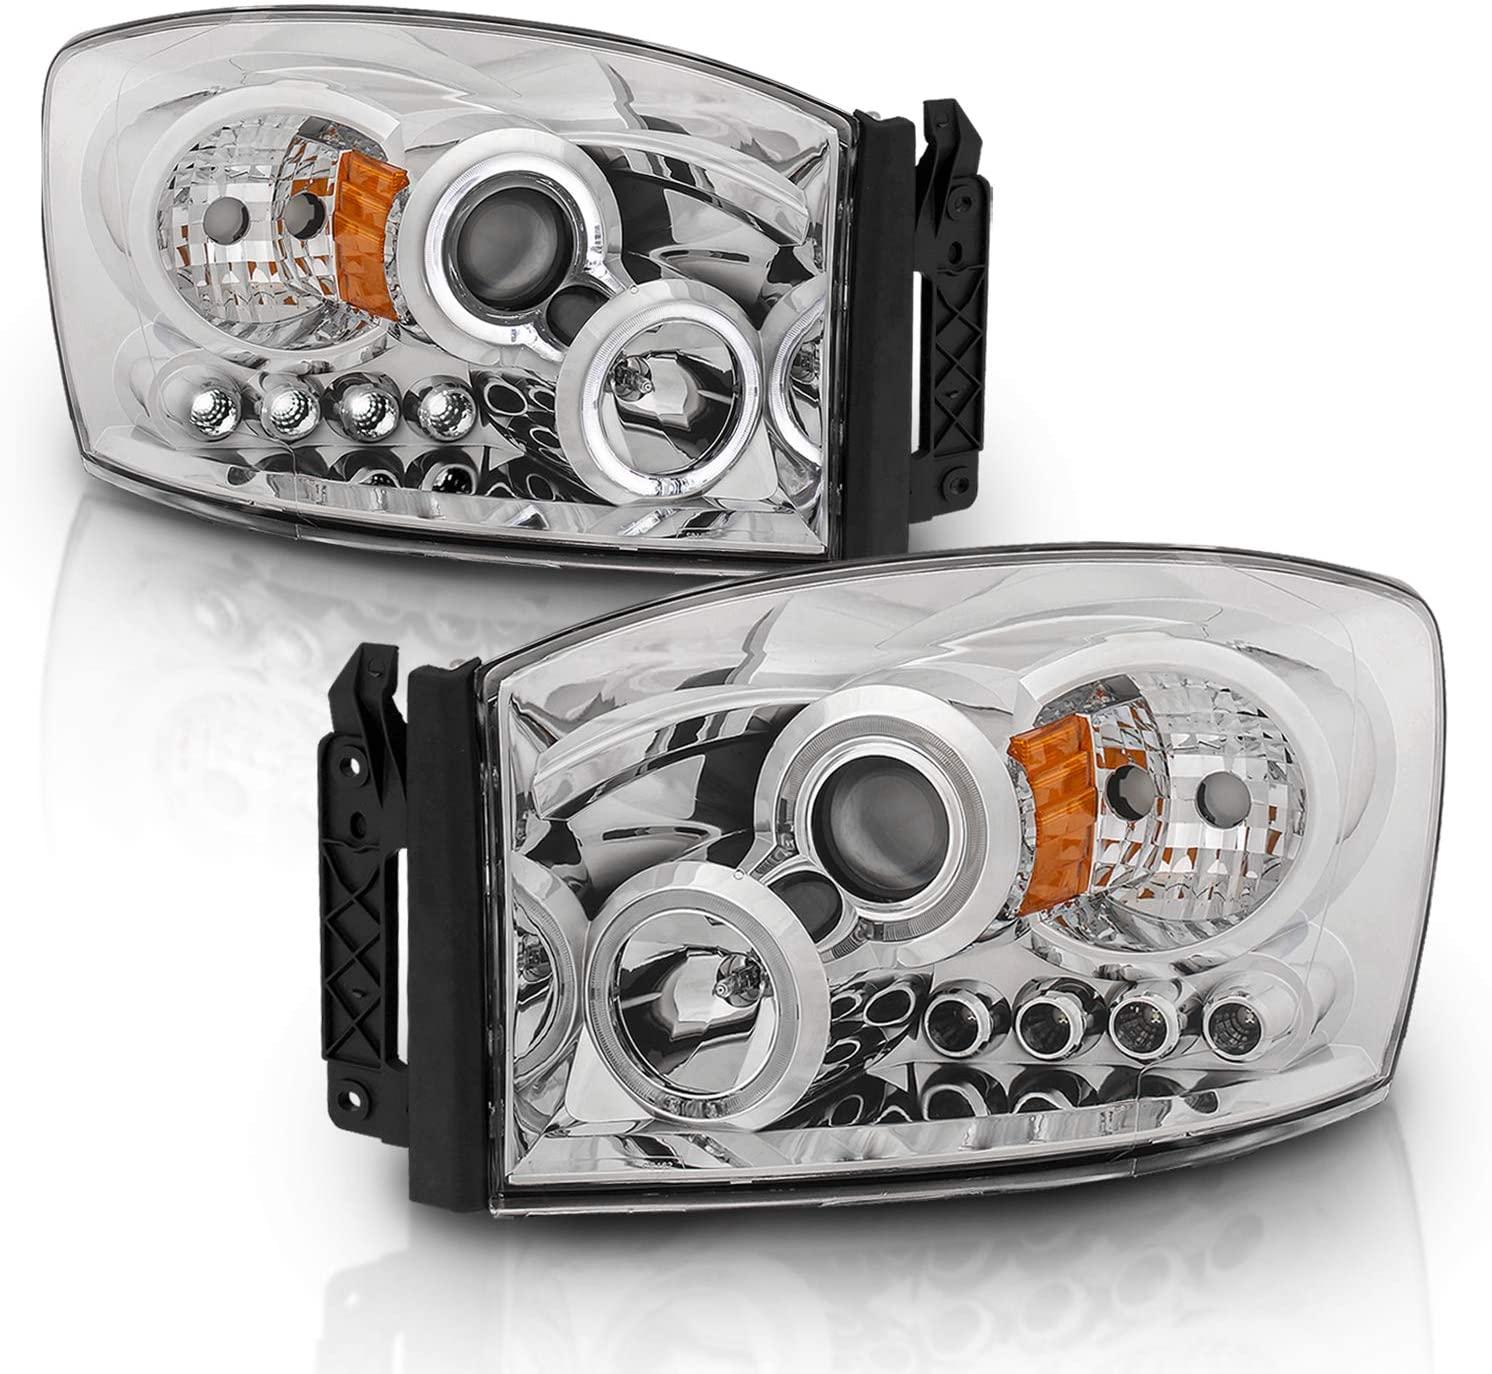 AmeriLite Chrome Projector Headlights LED Halo for Dodge Ram - Passenger and Driver Side